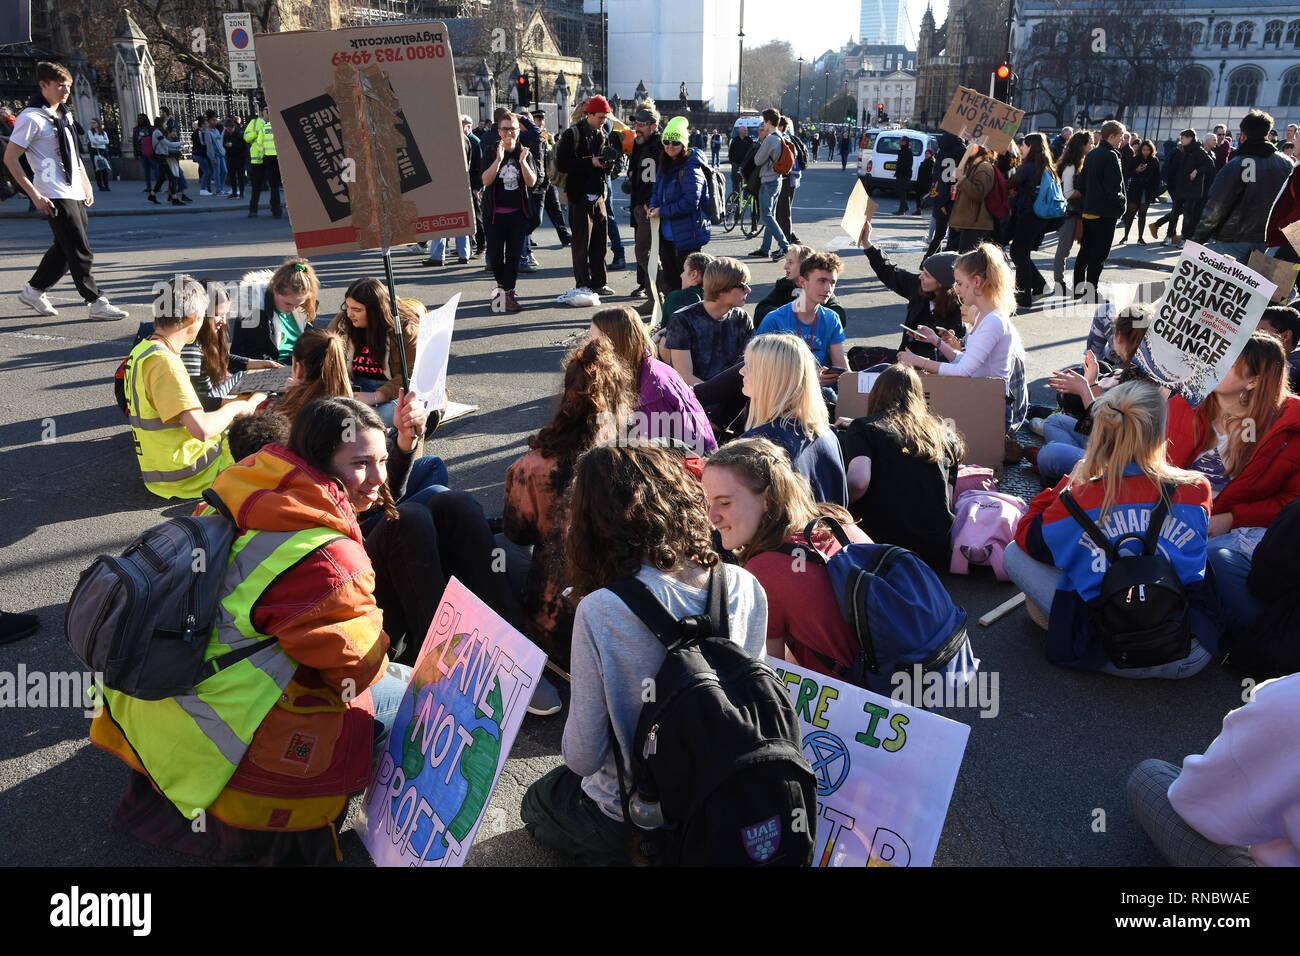 Siéntese protesta estudiantil.El Cambio Climático protesta estudiantil,Parliament Square, Westminster, Londres.UK Imagen De Stock